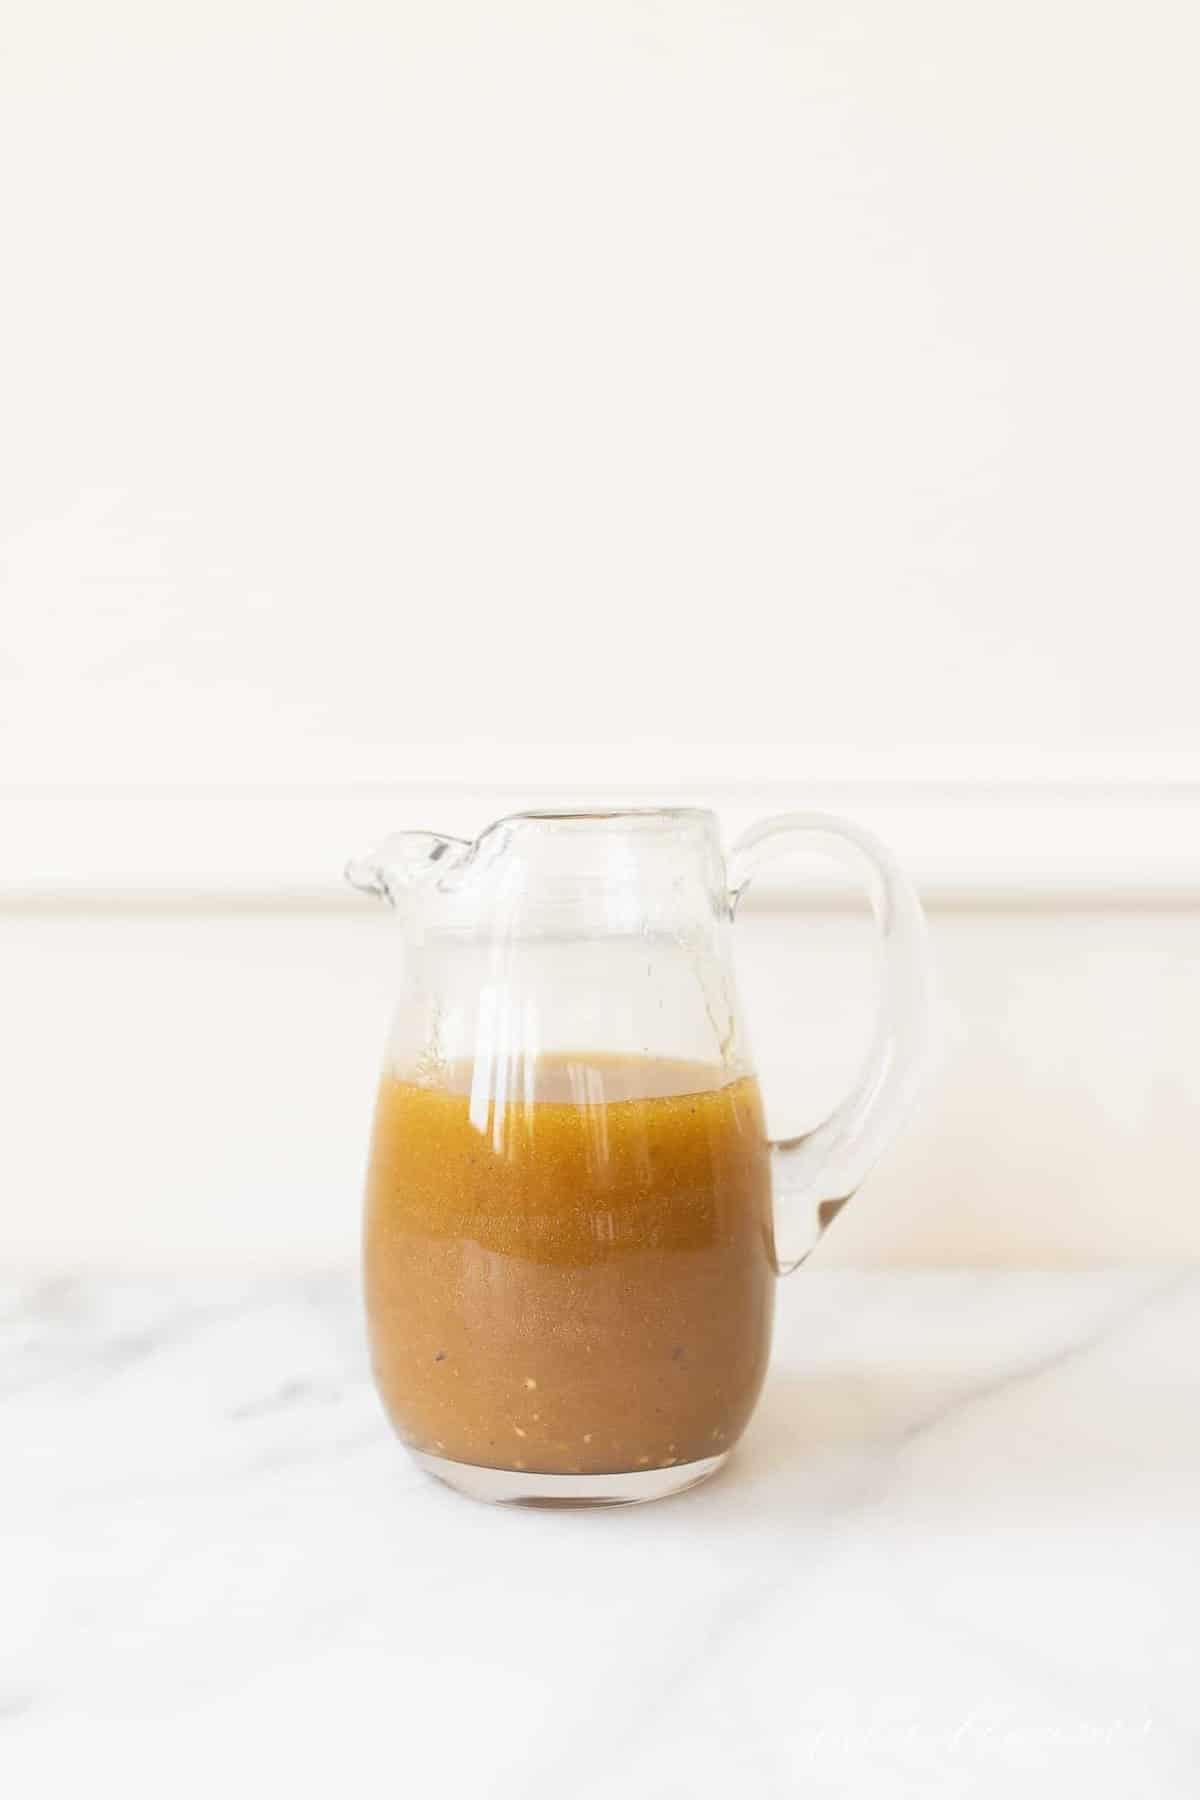 A clear glass pitcher of homemade vinaigrette dressing.